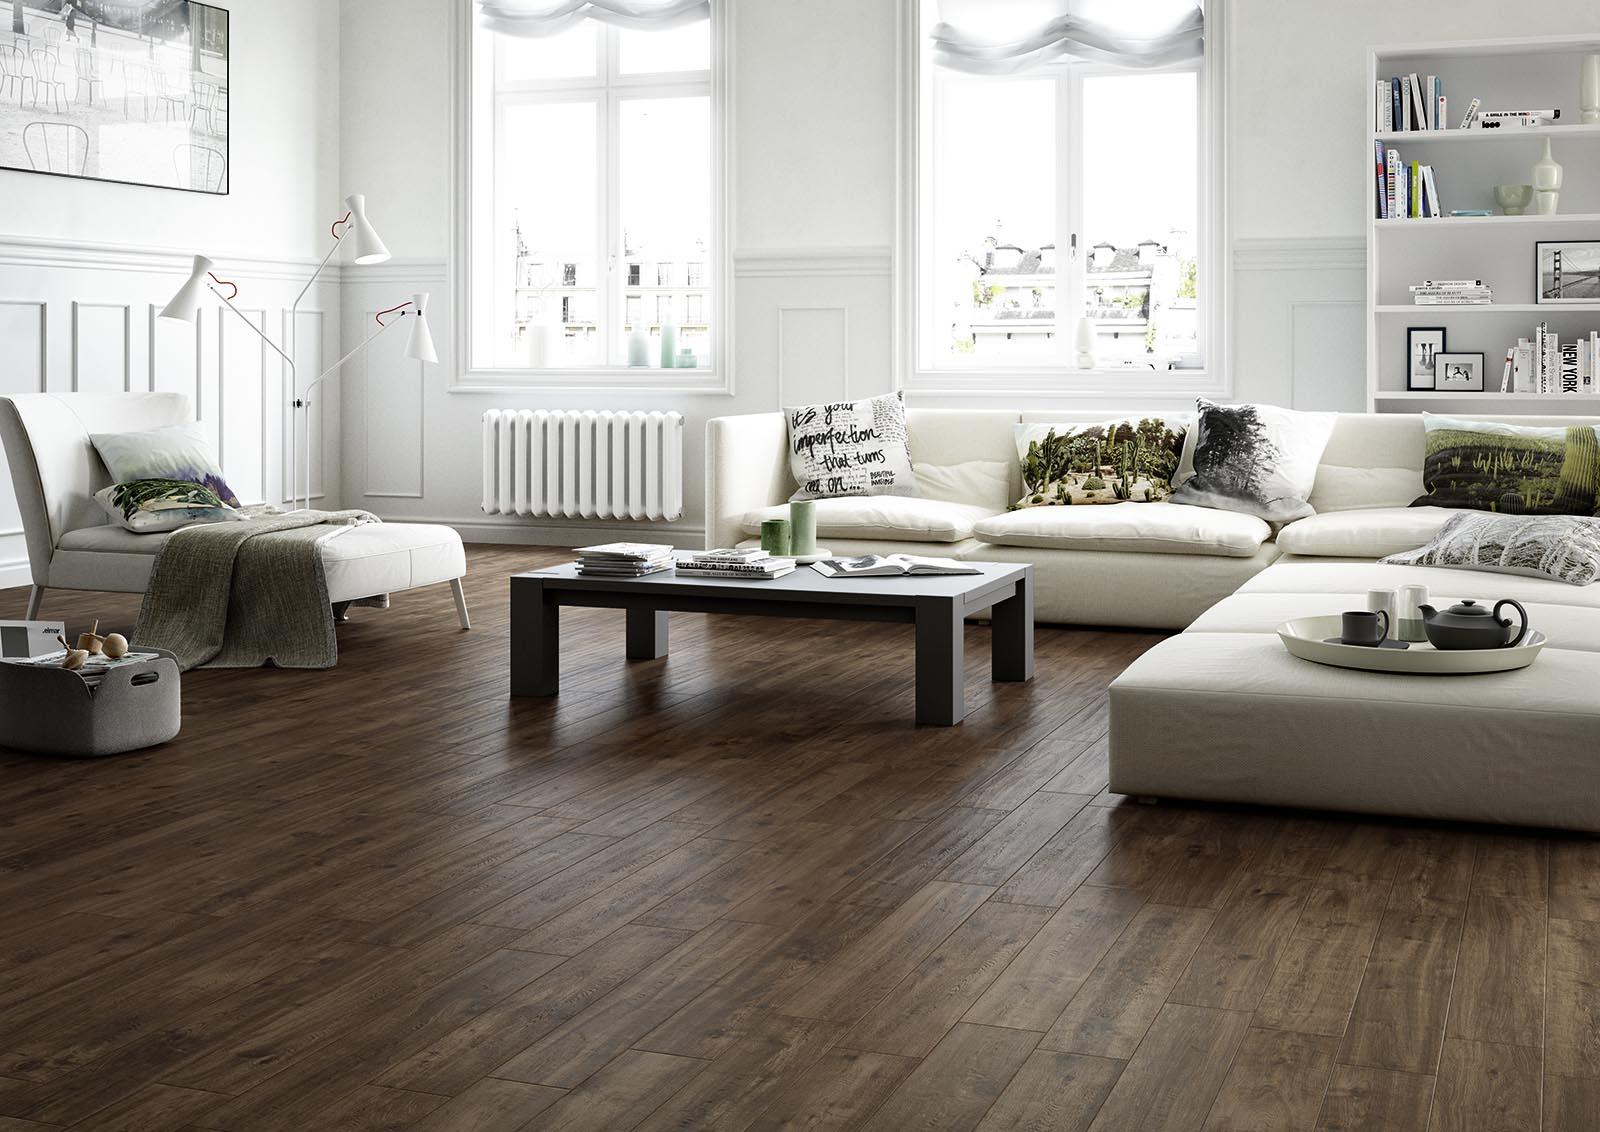 Treverkway wood effect stoneware floors marazzi - Ceramico imitacion madera ...